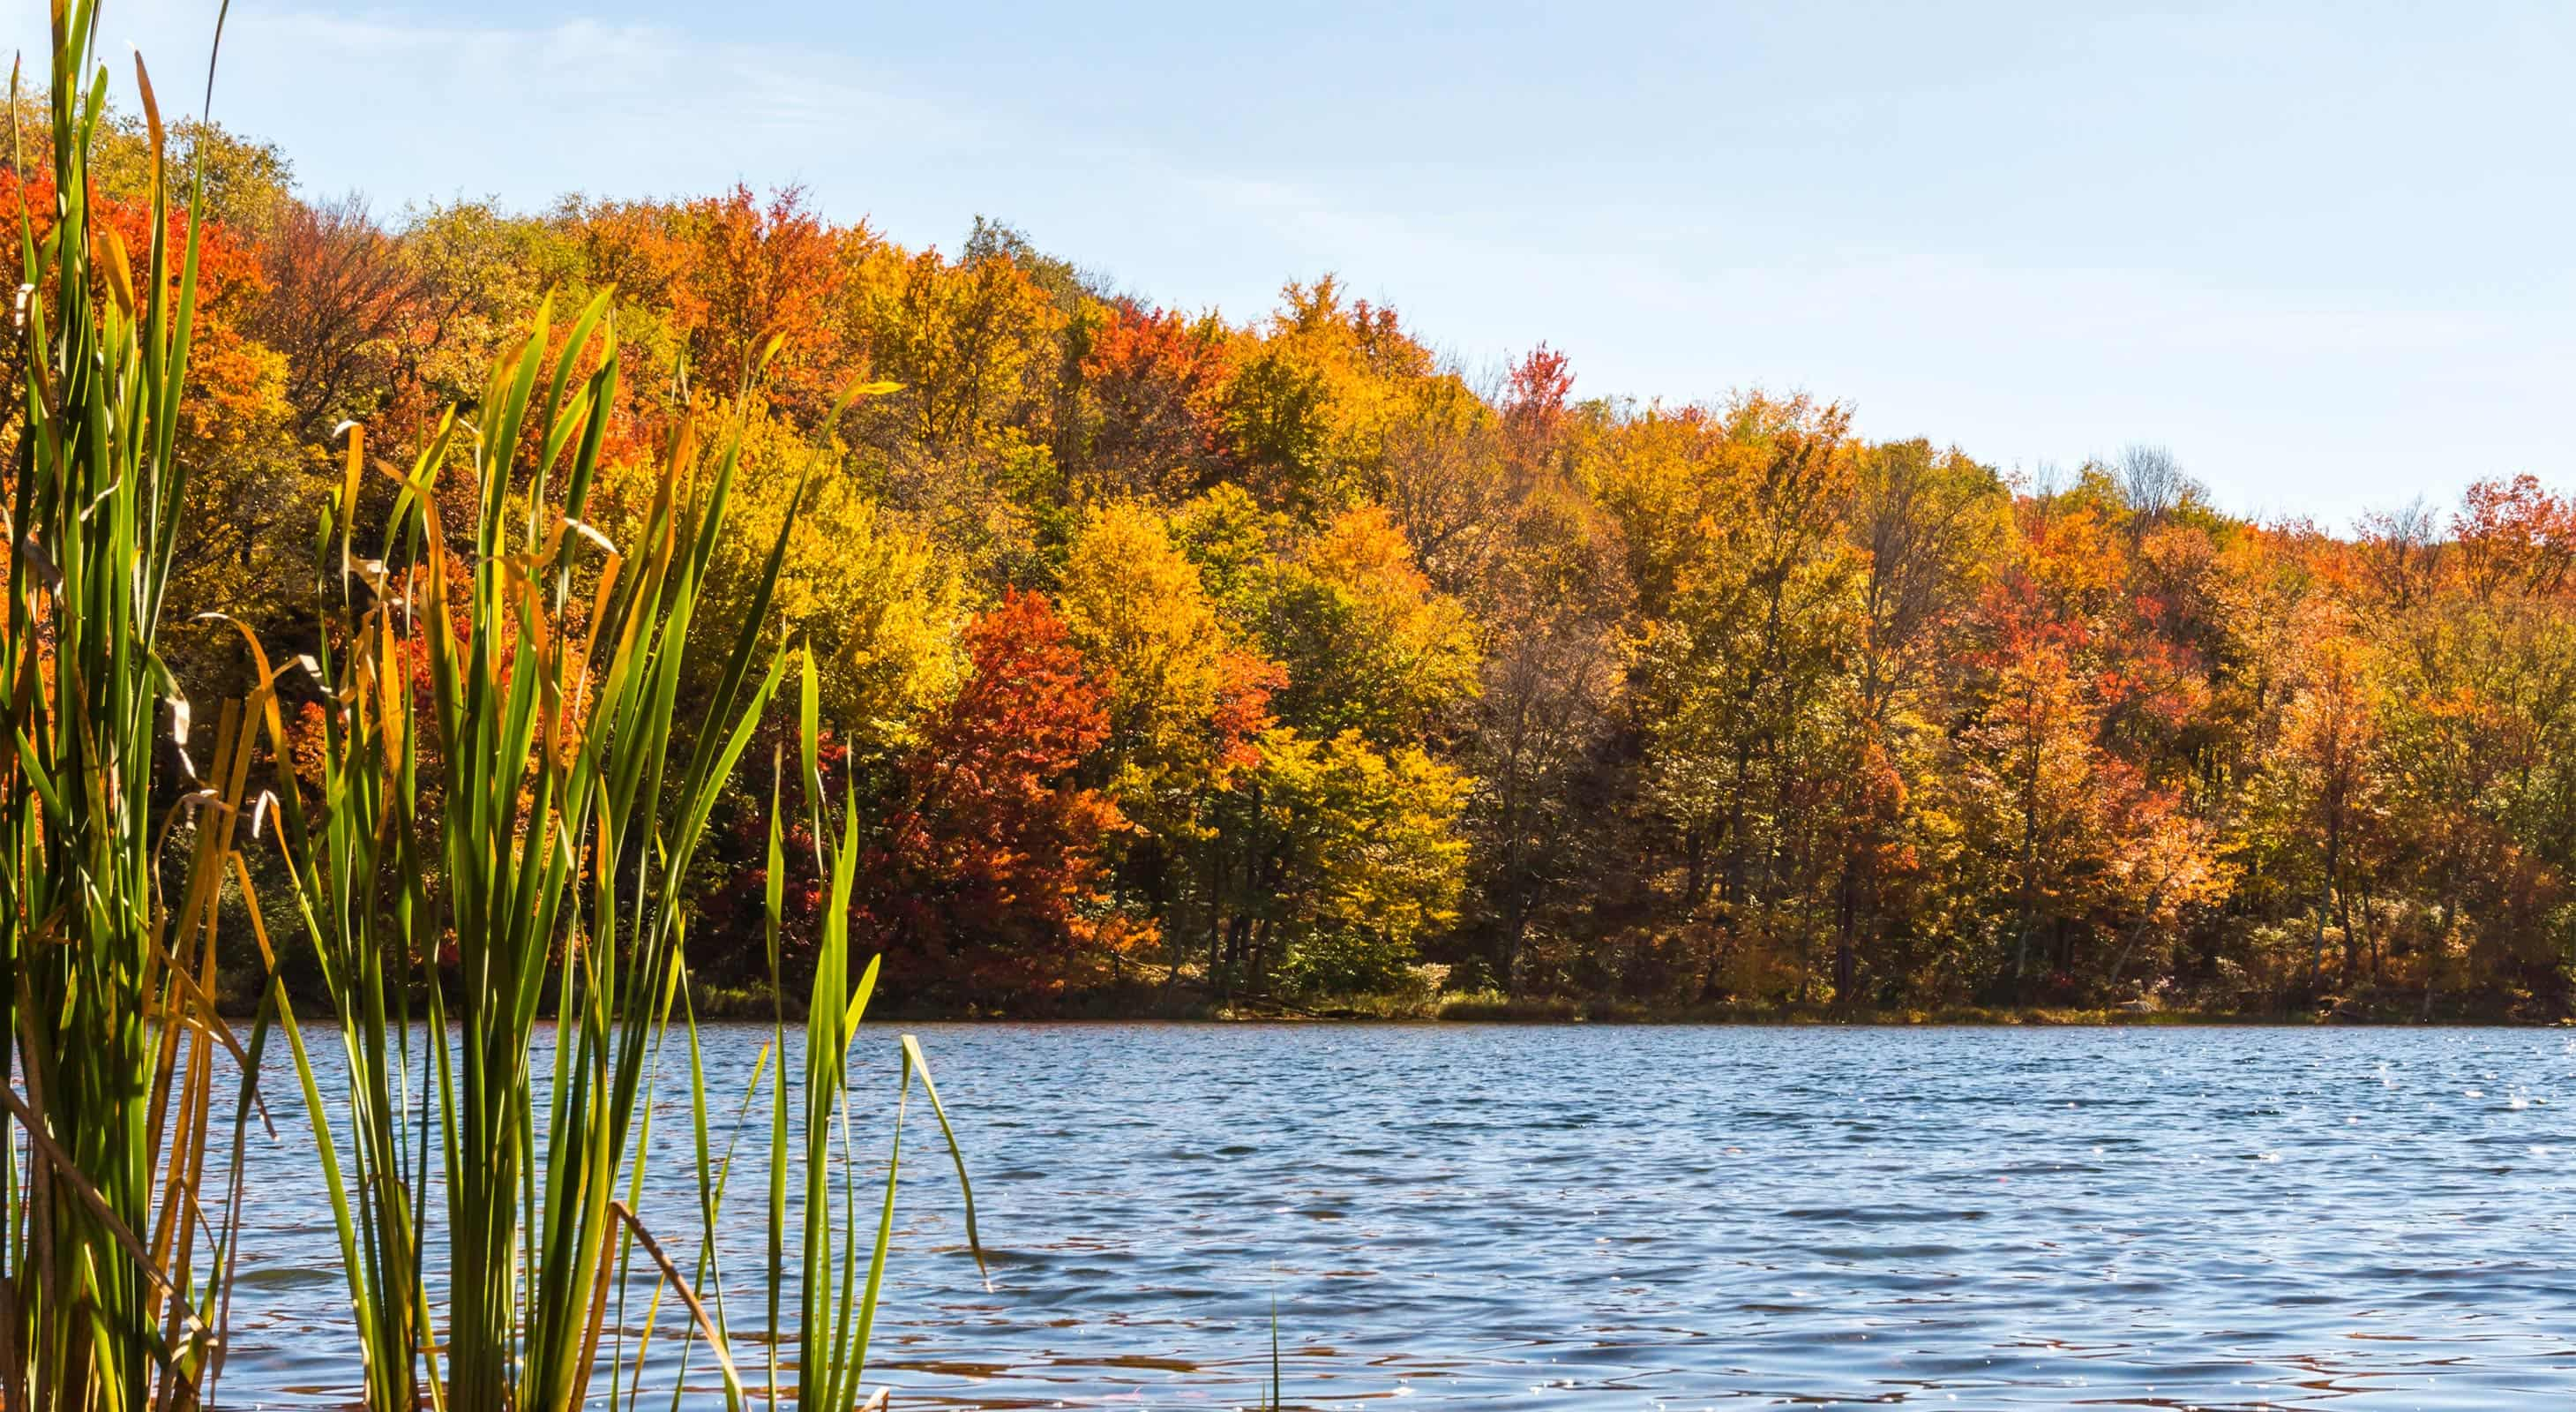 Lake with Fall Foliage Trees